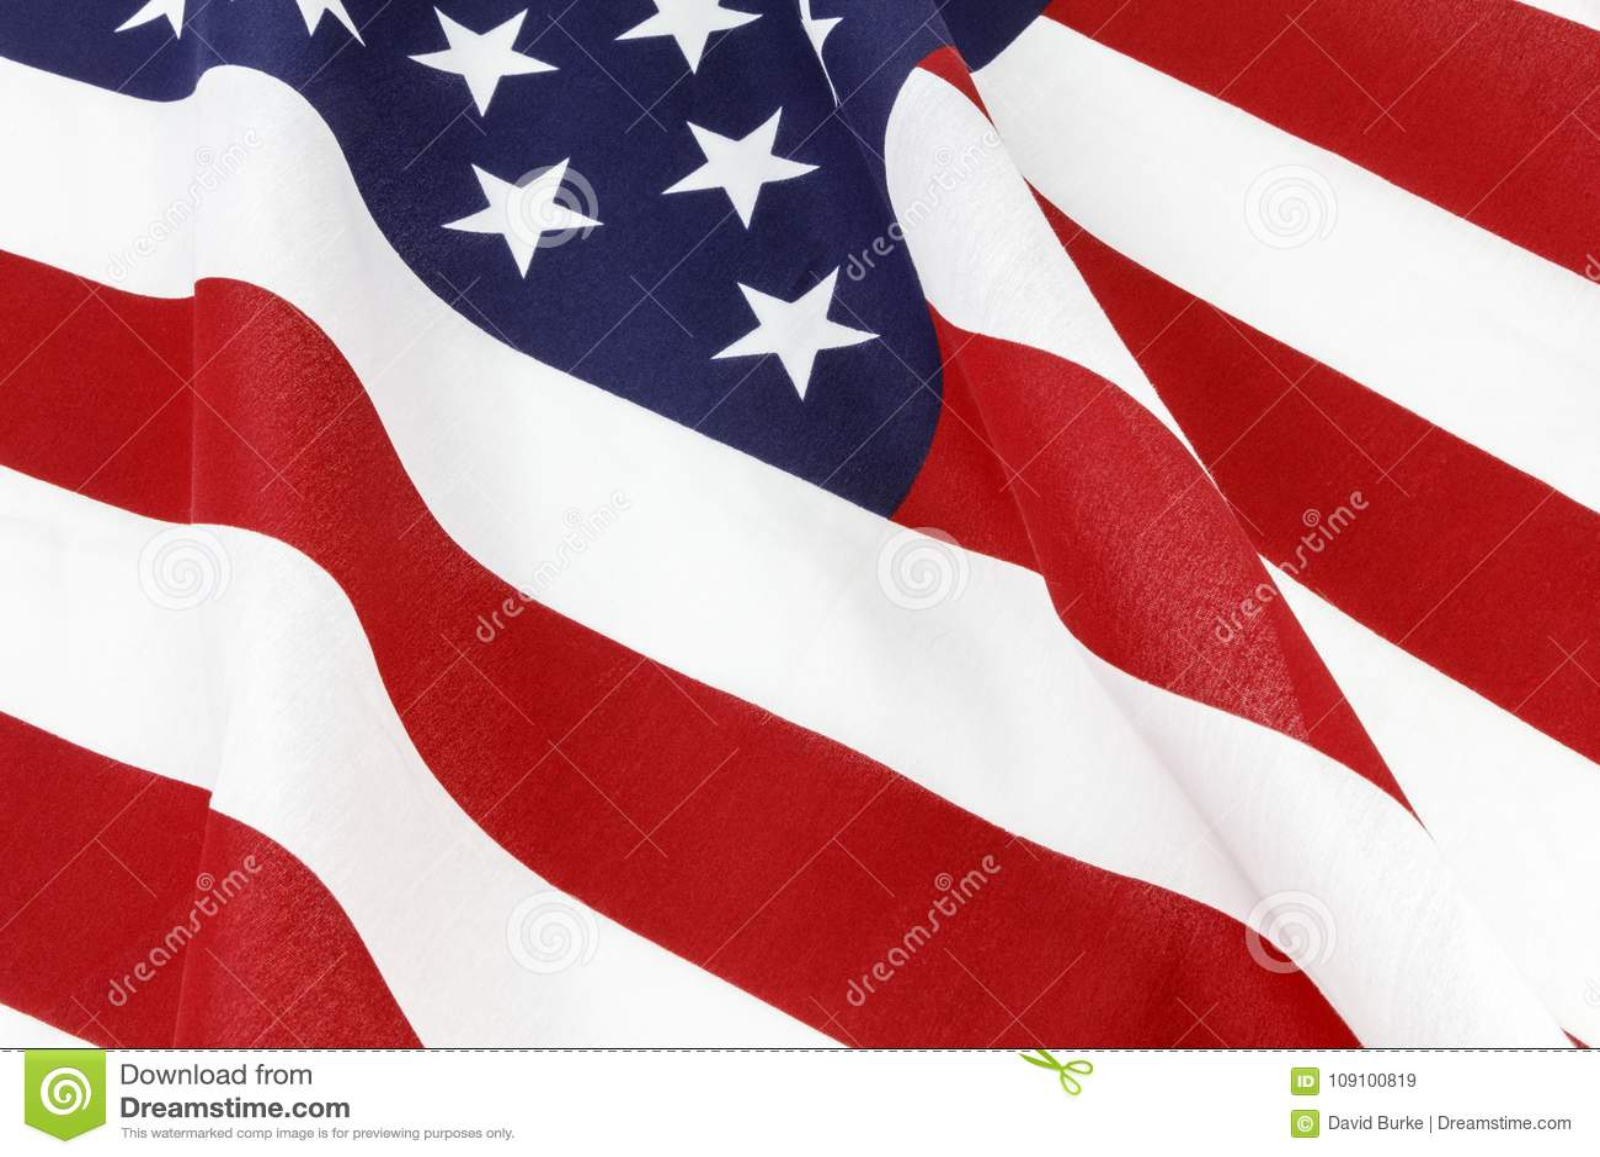 American flag waving display